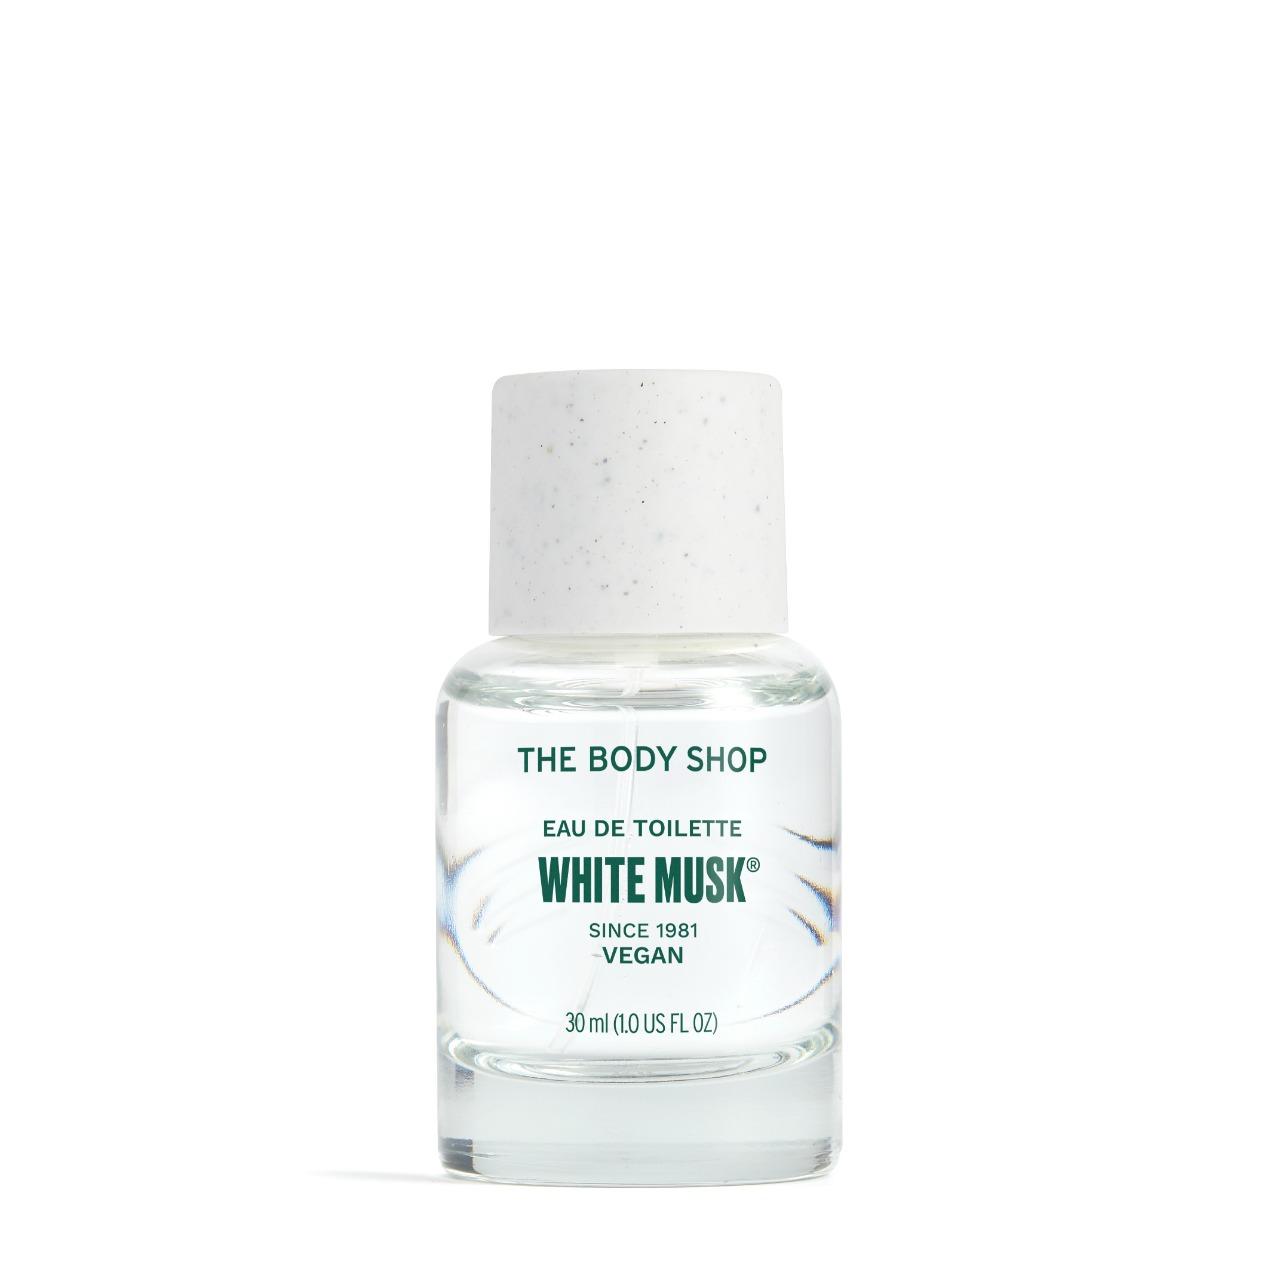 Rilis Ulang Koleksi White Musk, The Body Shop Dorong Terus Pengesahan RUU PKS!